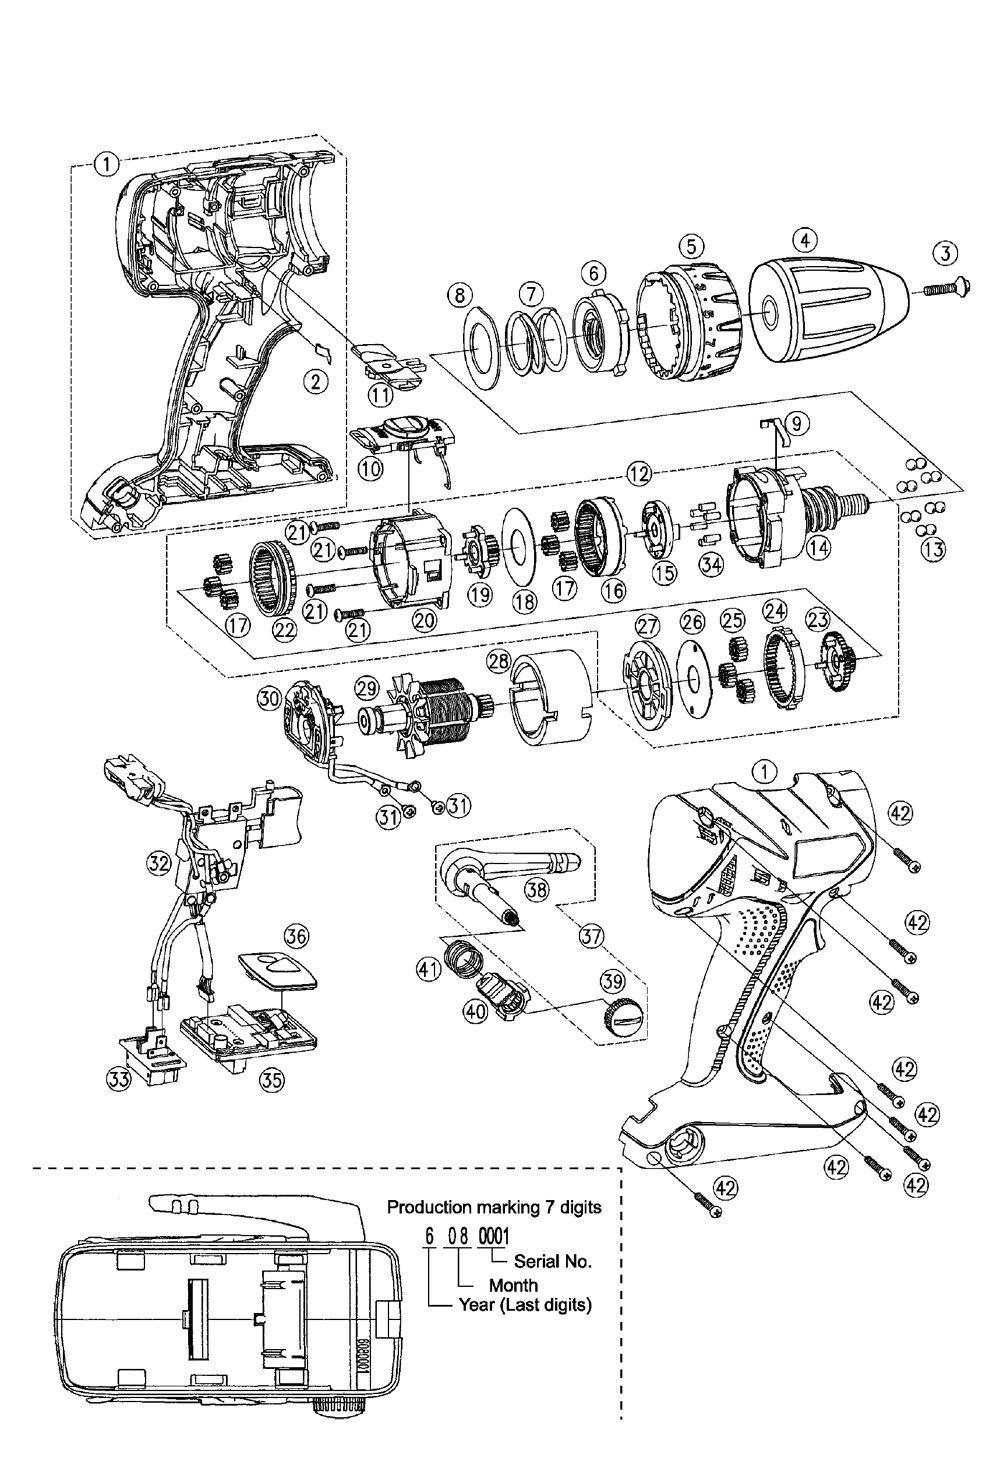 Panasonic Ey7440 Parts List